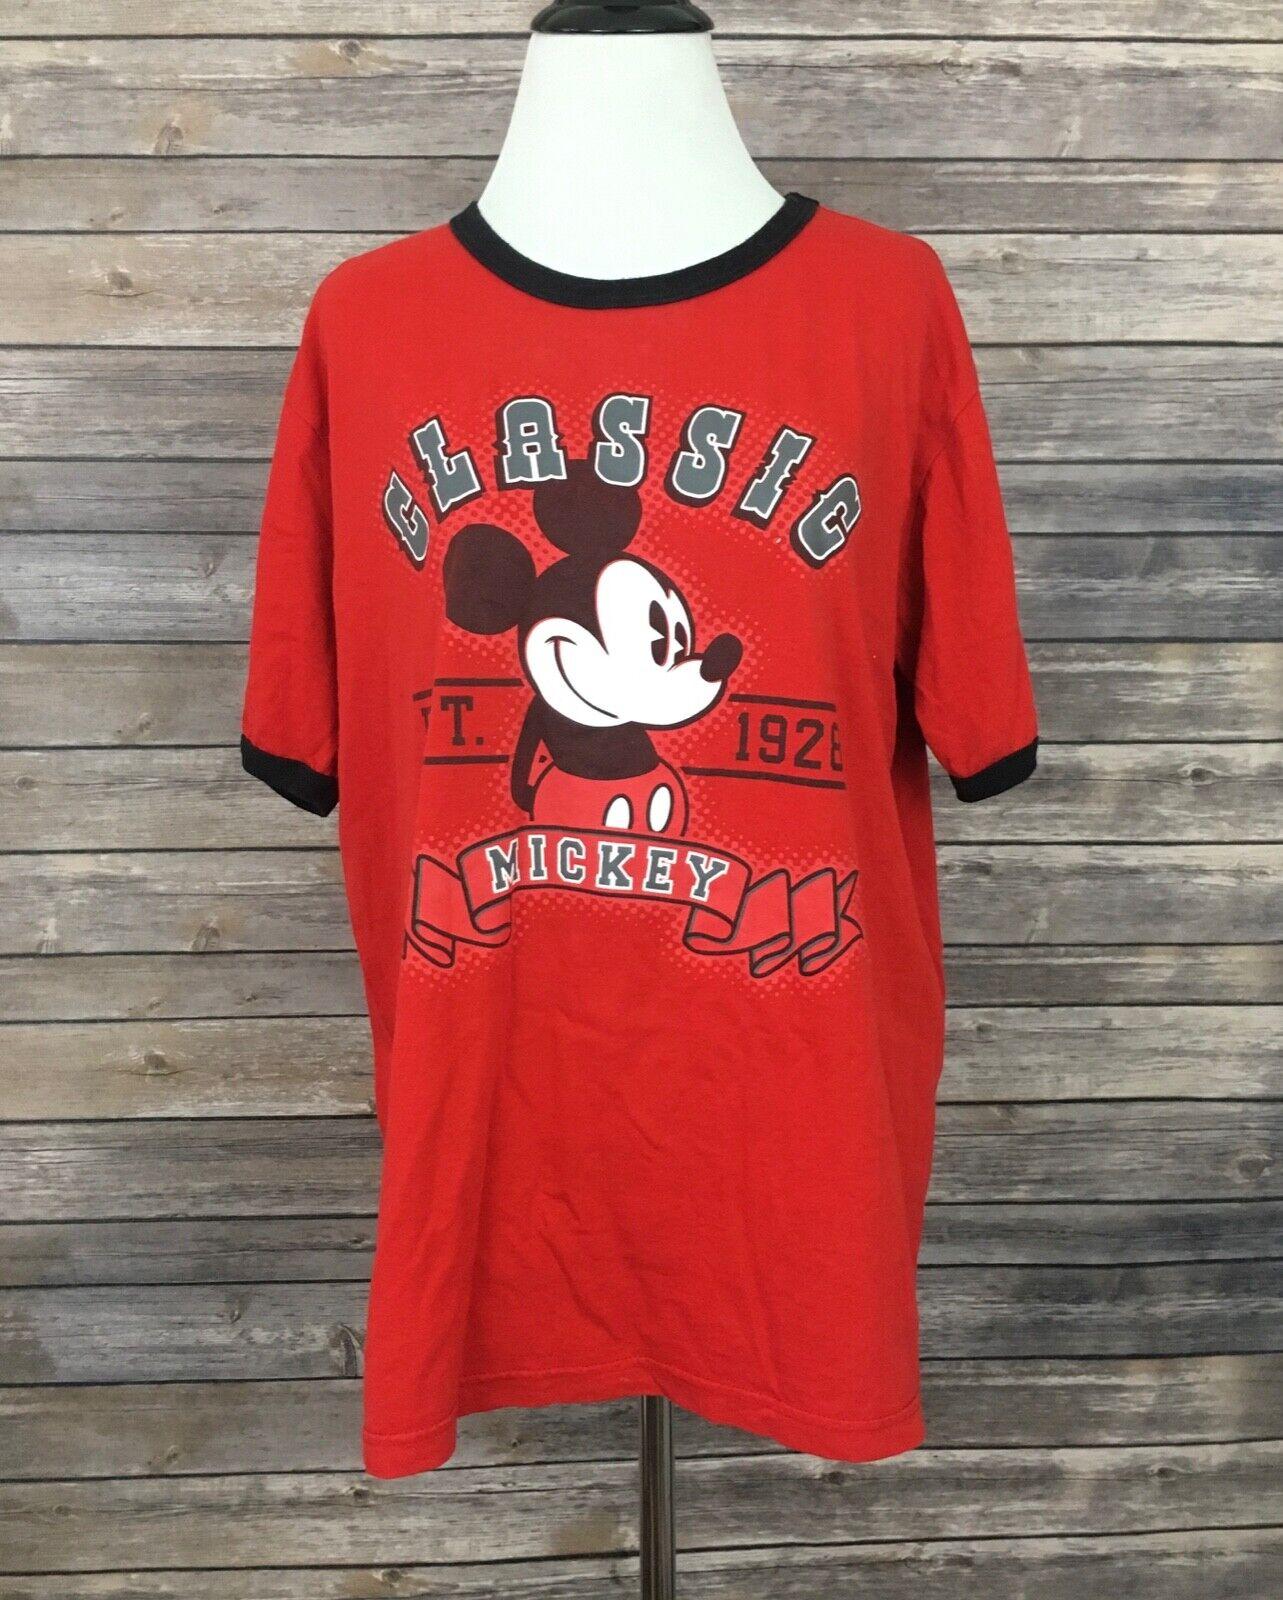 Disney Store organic cotton classic Mickey t-shirt